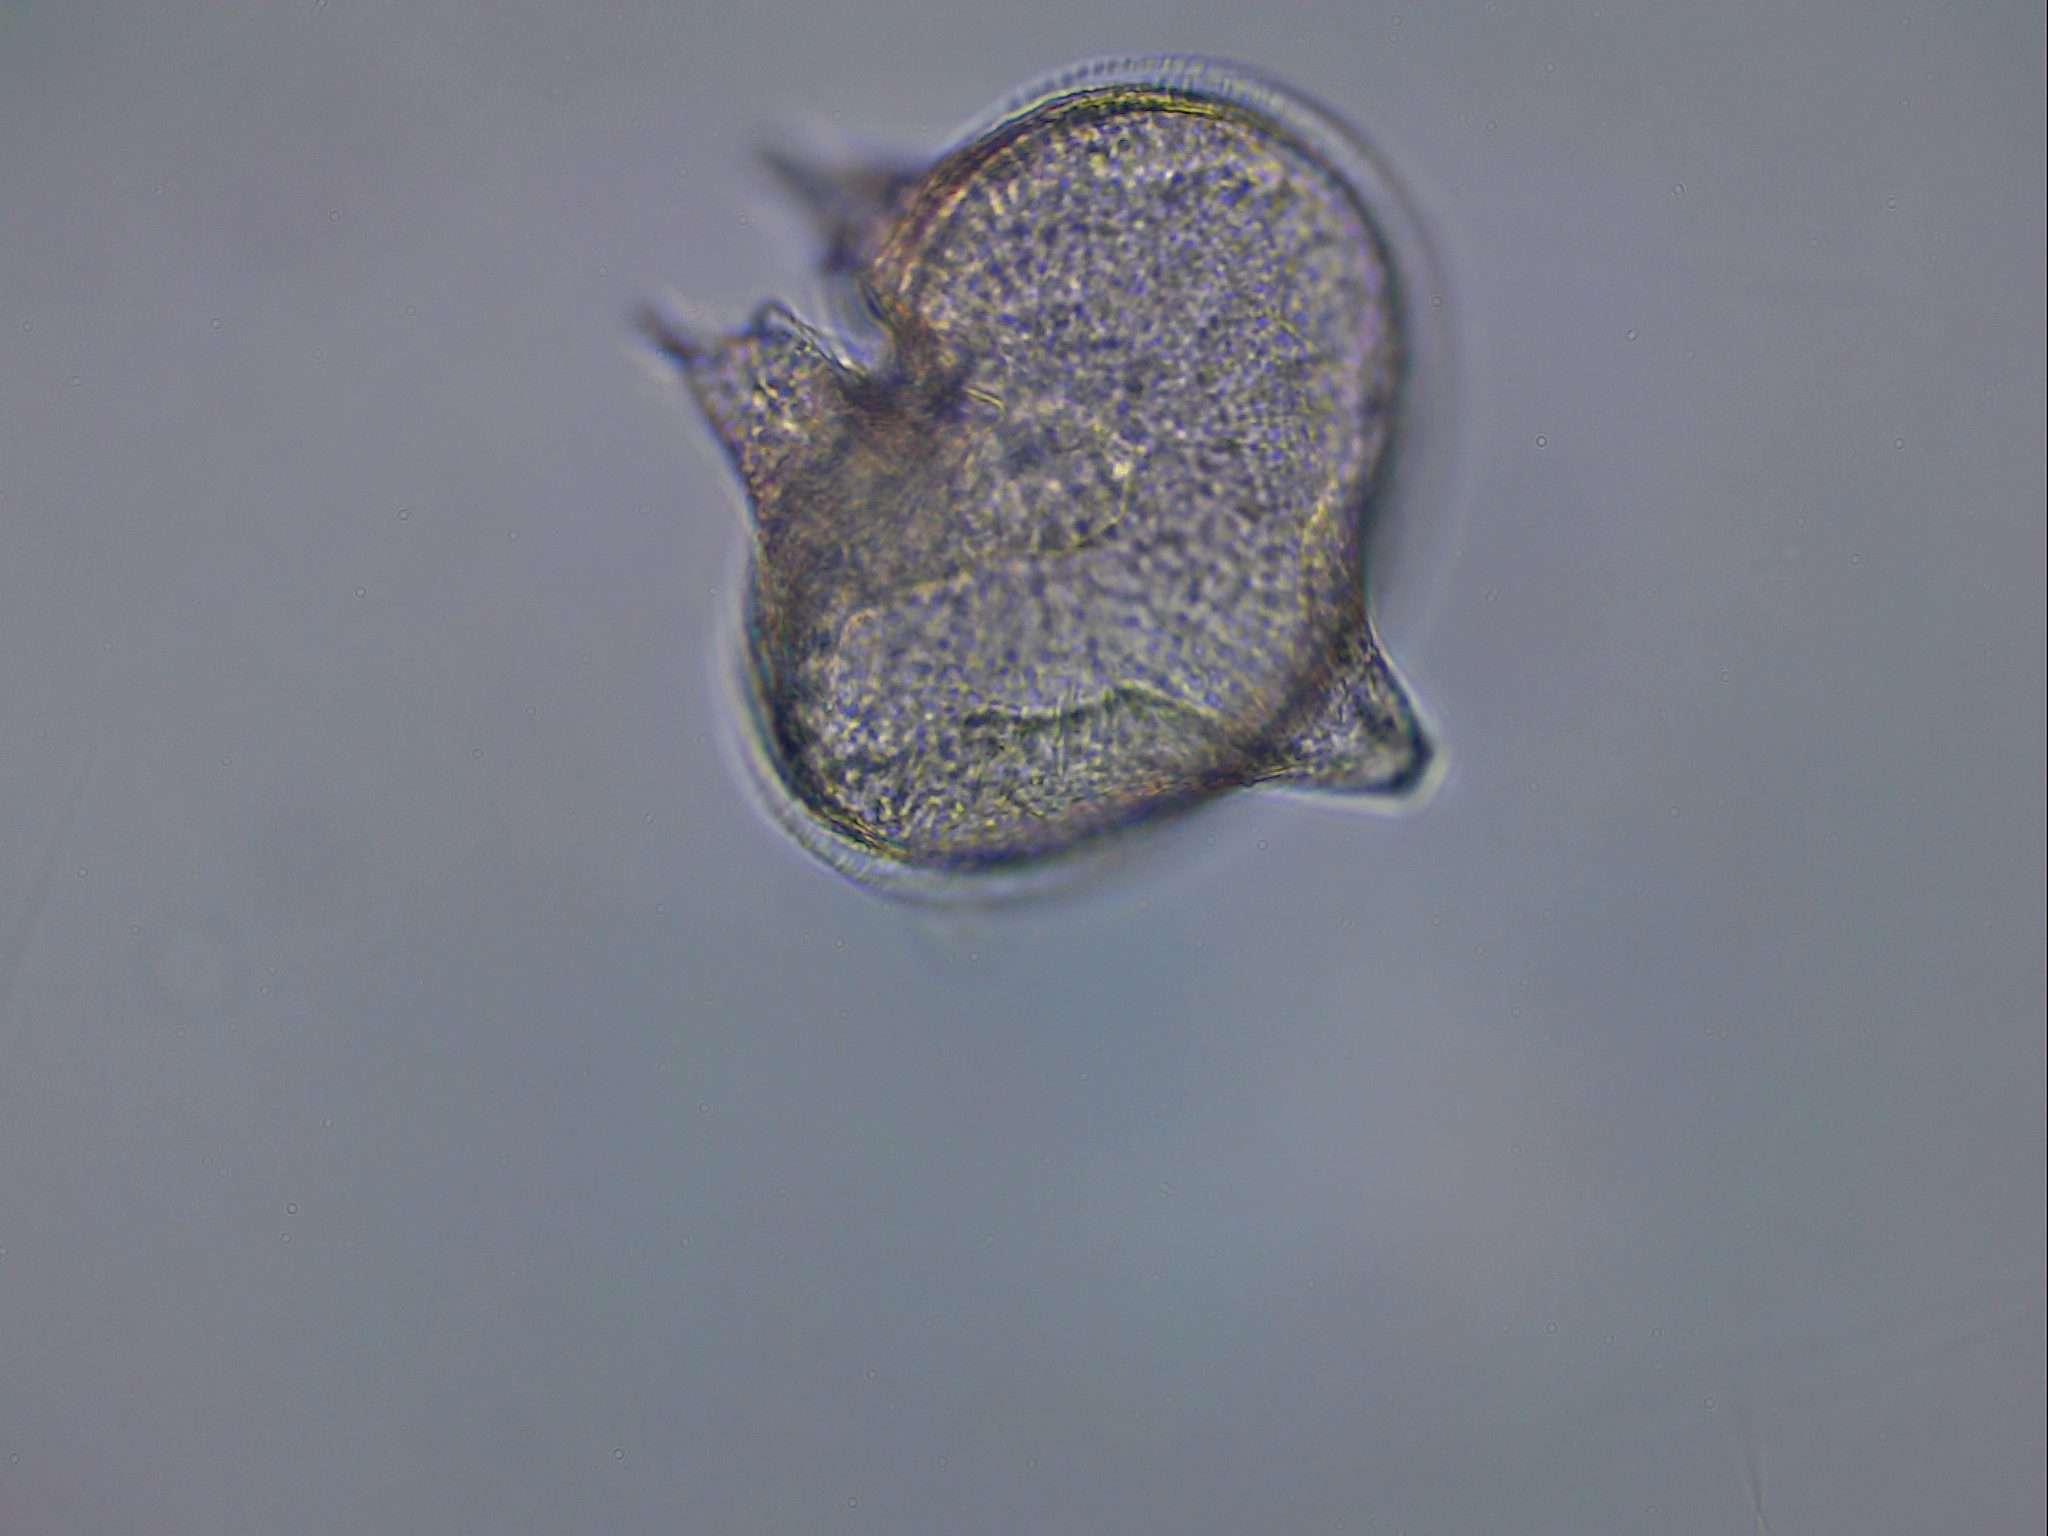 Protoperidinium